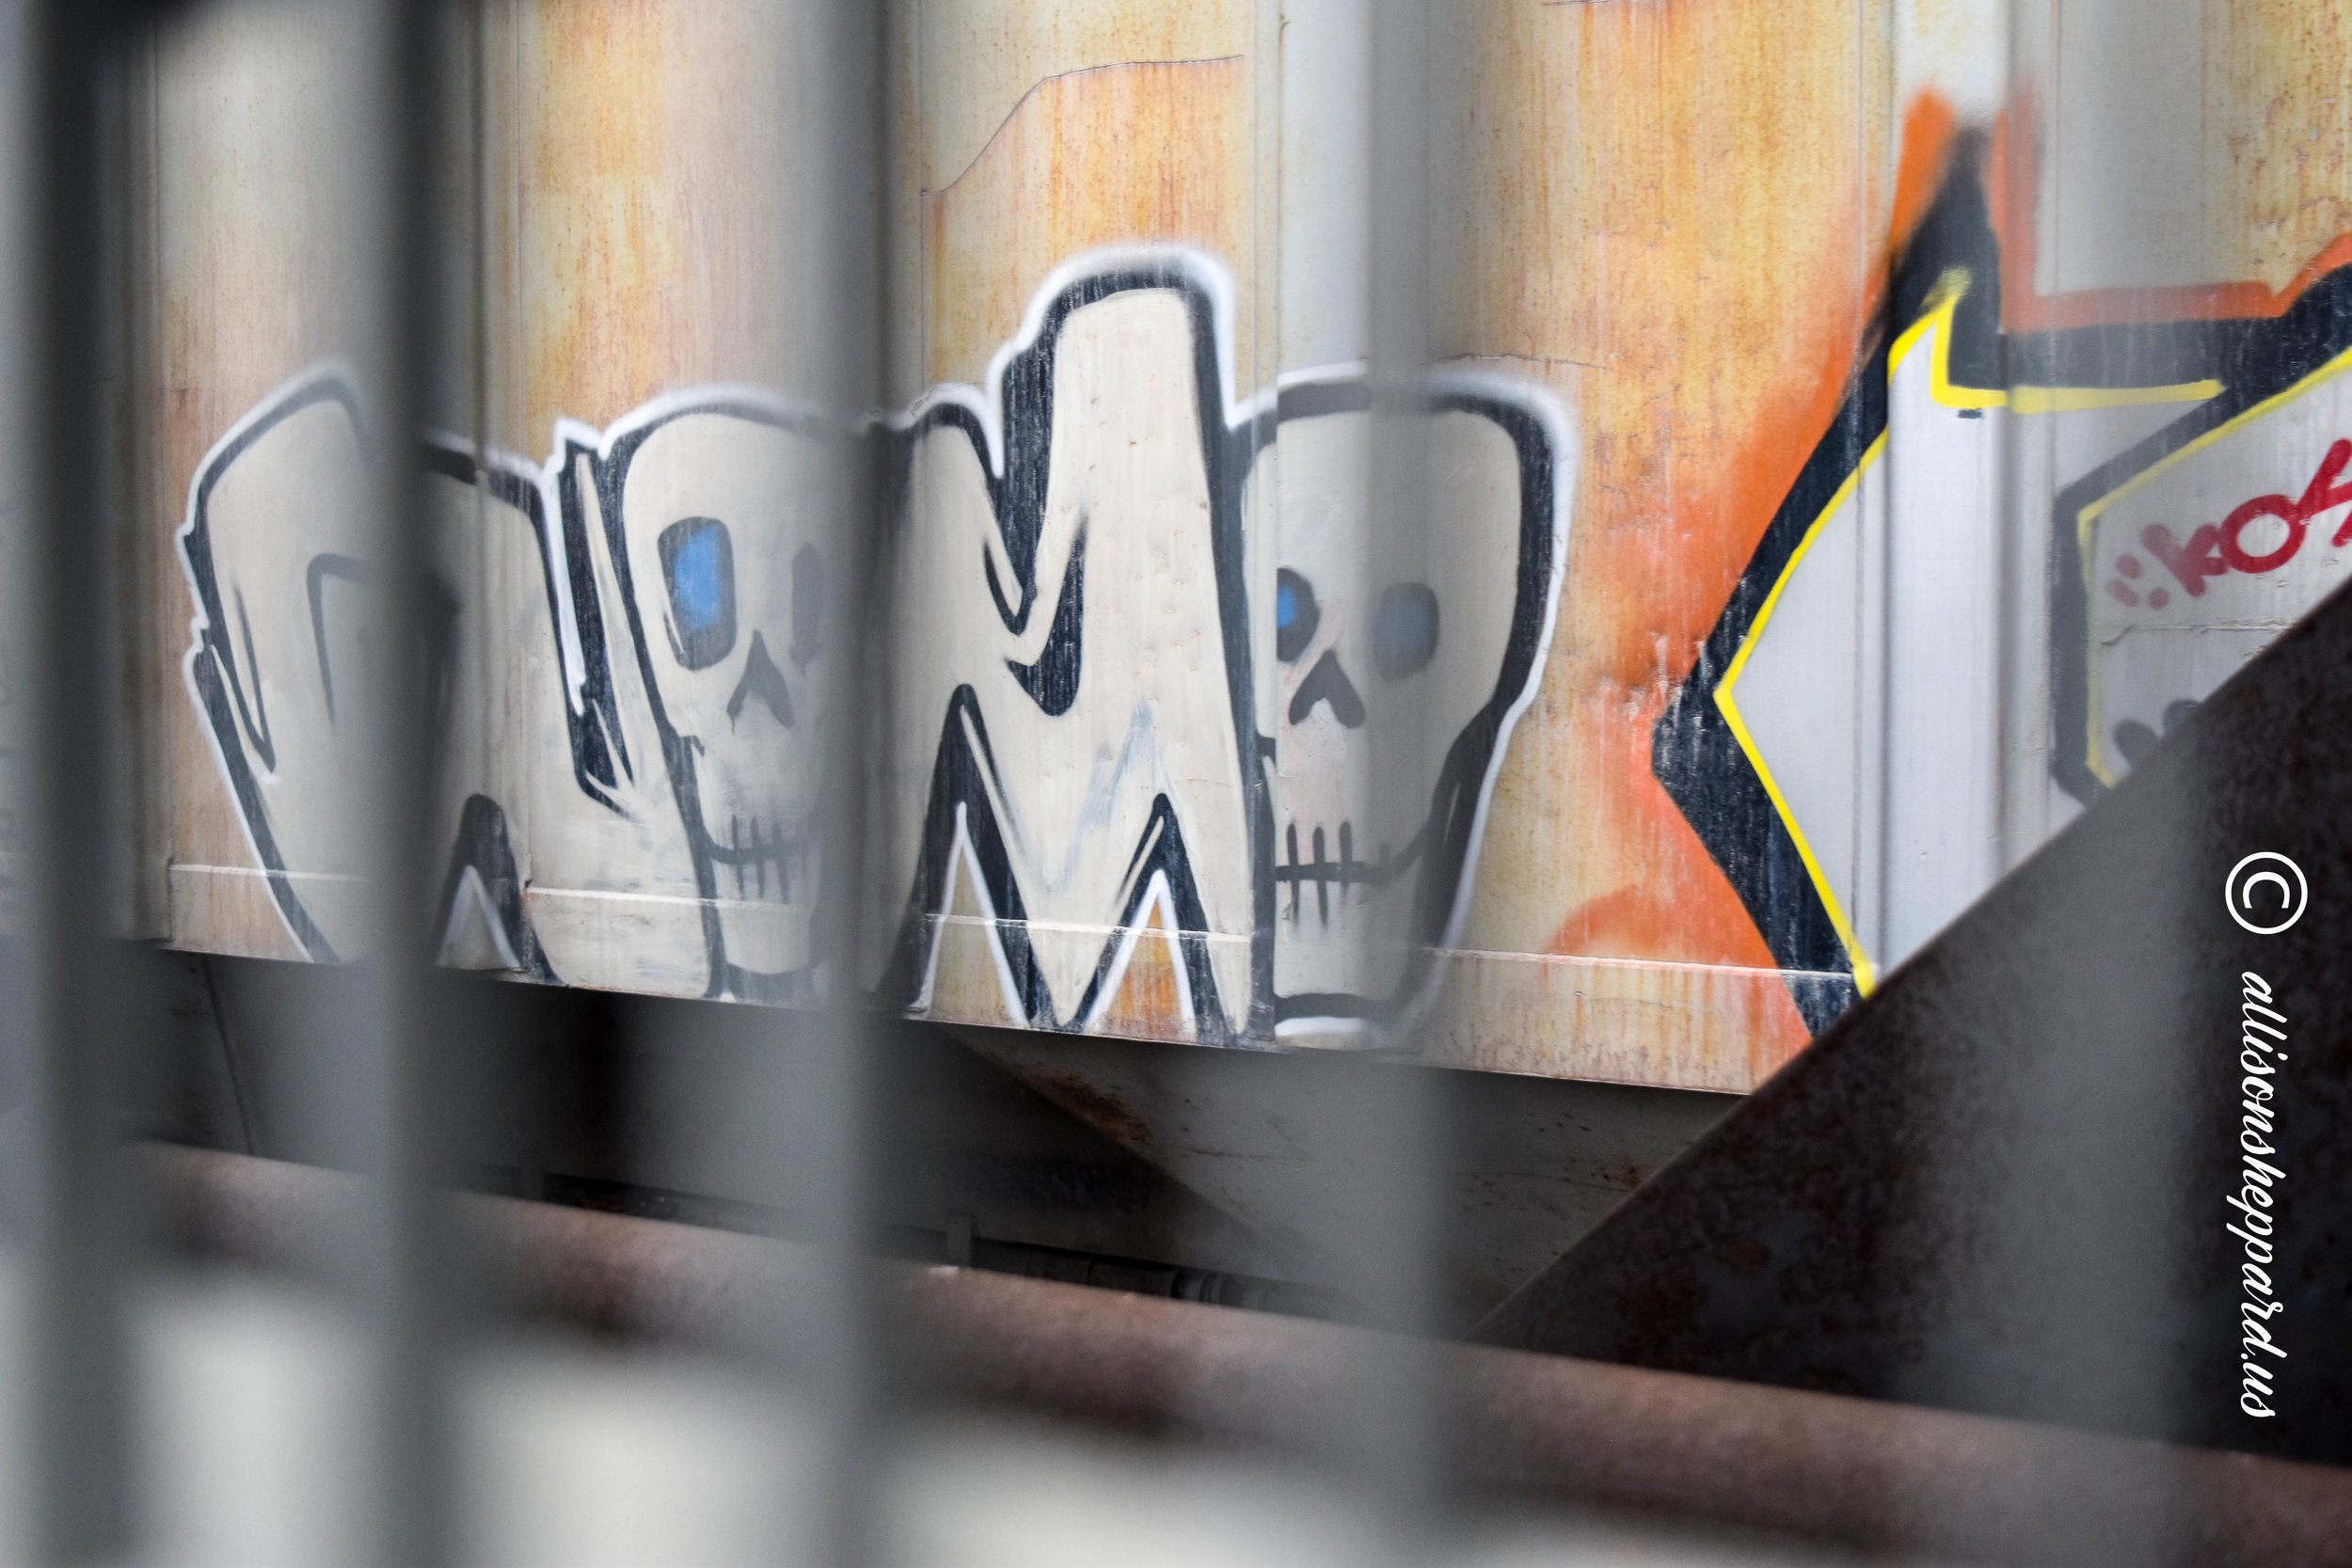 BRC-train-skulls graffiti.jpg